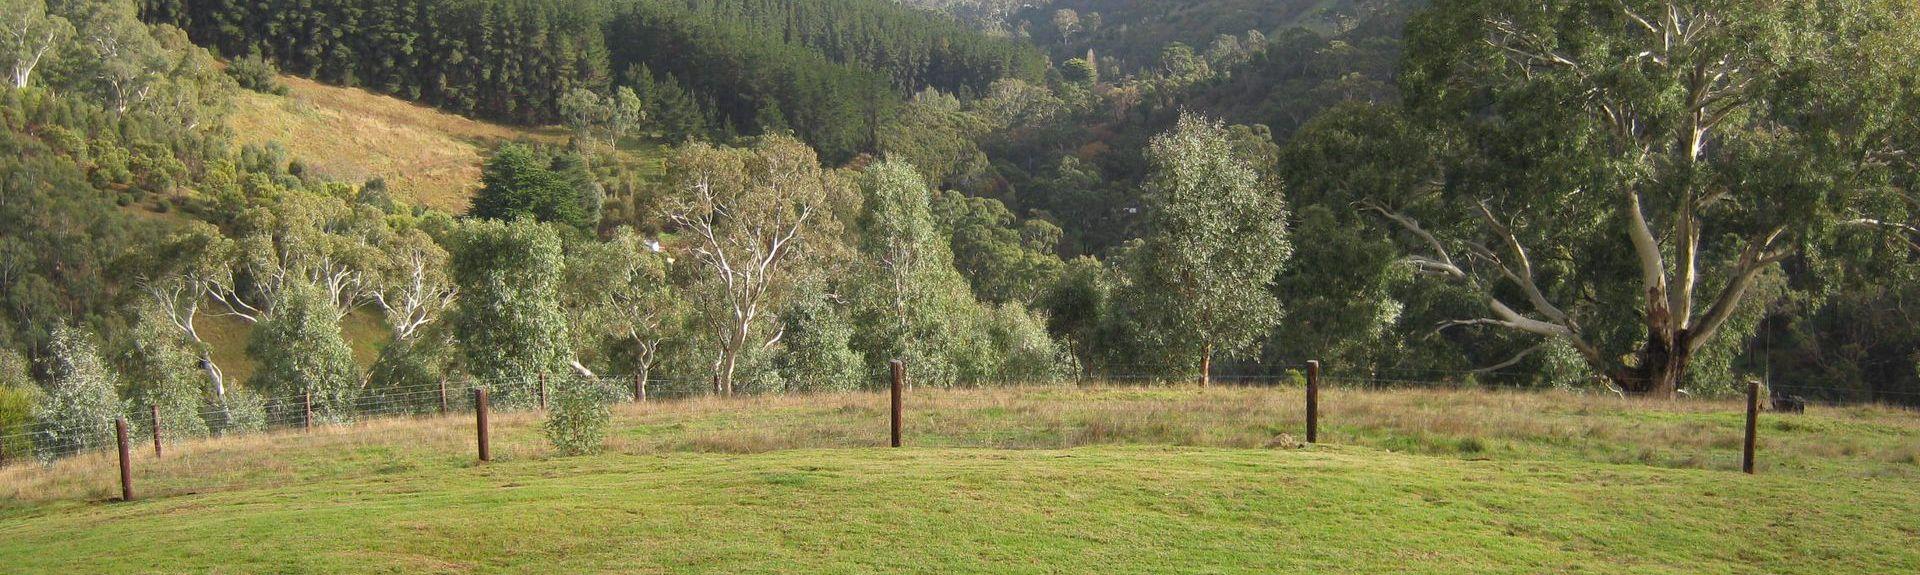 Coromandel East, South Australia, AU